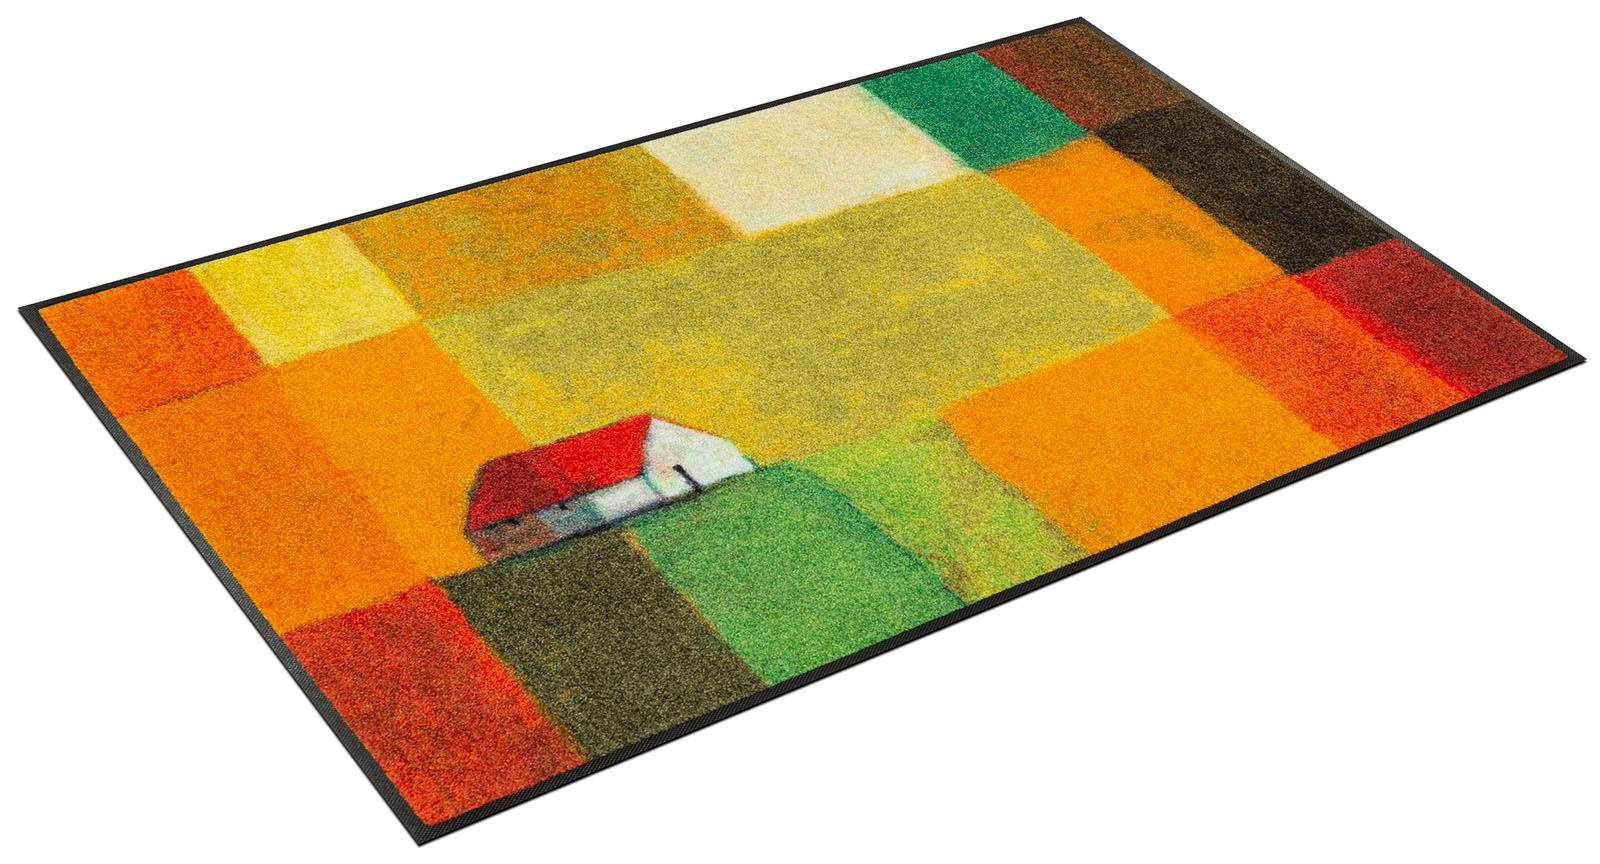 Teppich Meadow Lands wash+dry by Kleen-Tex rechteckig Höhe 7 mm gedruckt